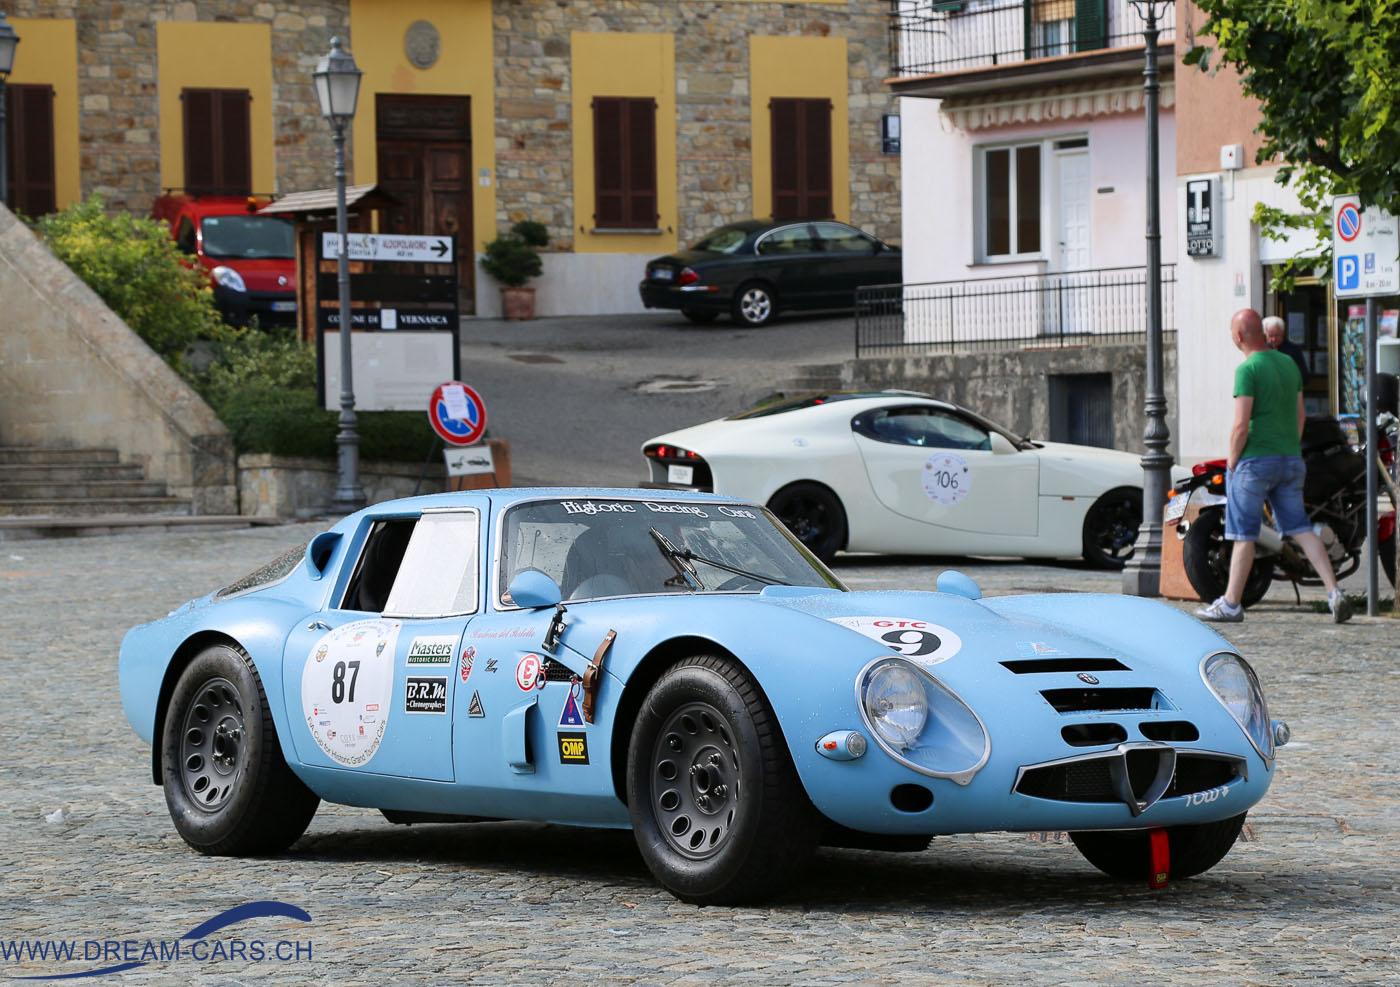 Vernasca Silver Flag 2016, Dorfplatz Vernasca. Alfa Romeo TZ 2 von 1965 auf dem Dorfplatz in Vernasca